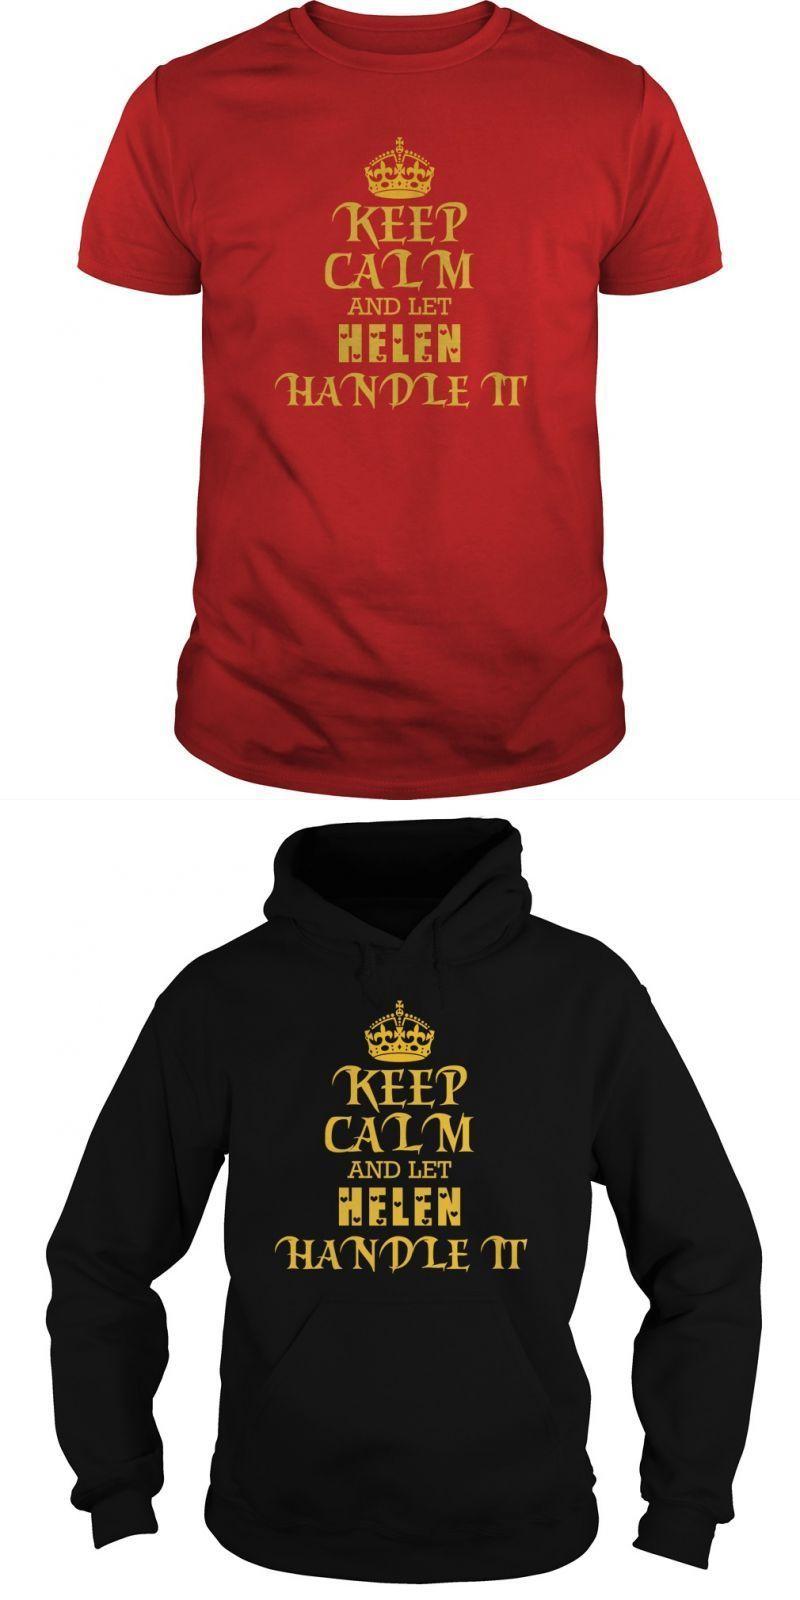 d57aba1b548e Van Halen T Shirt Ladies